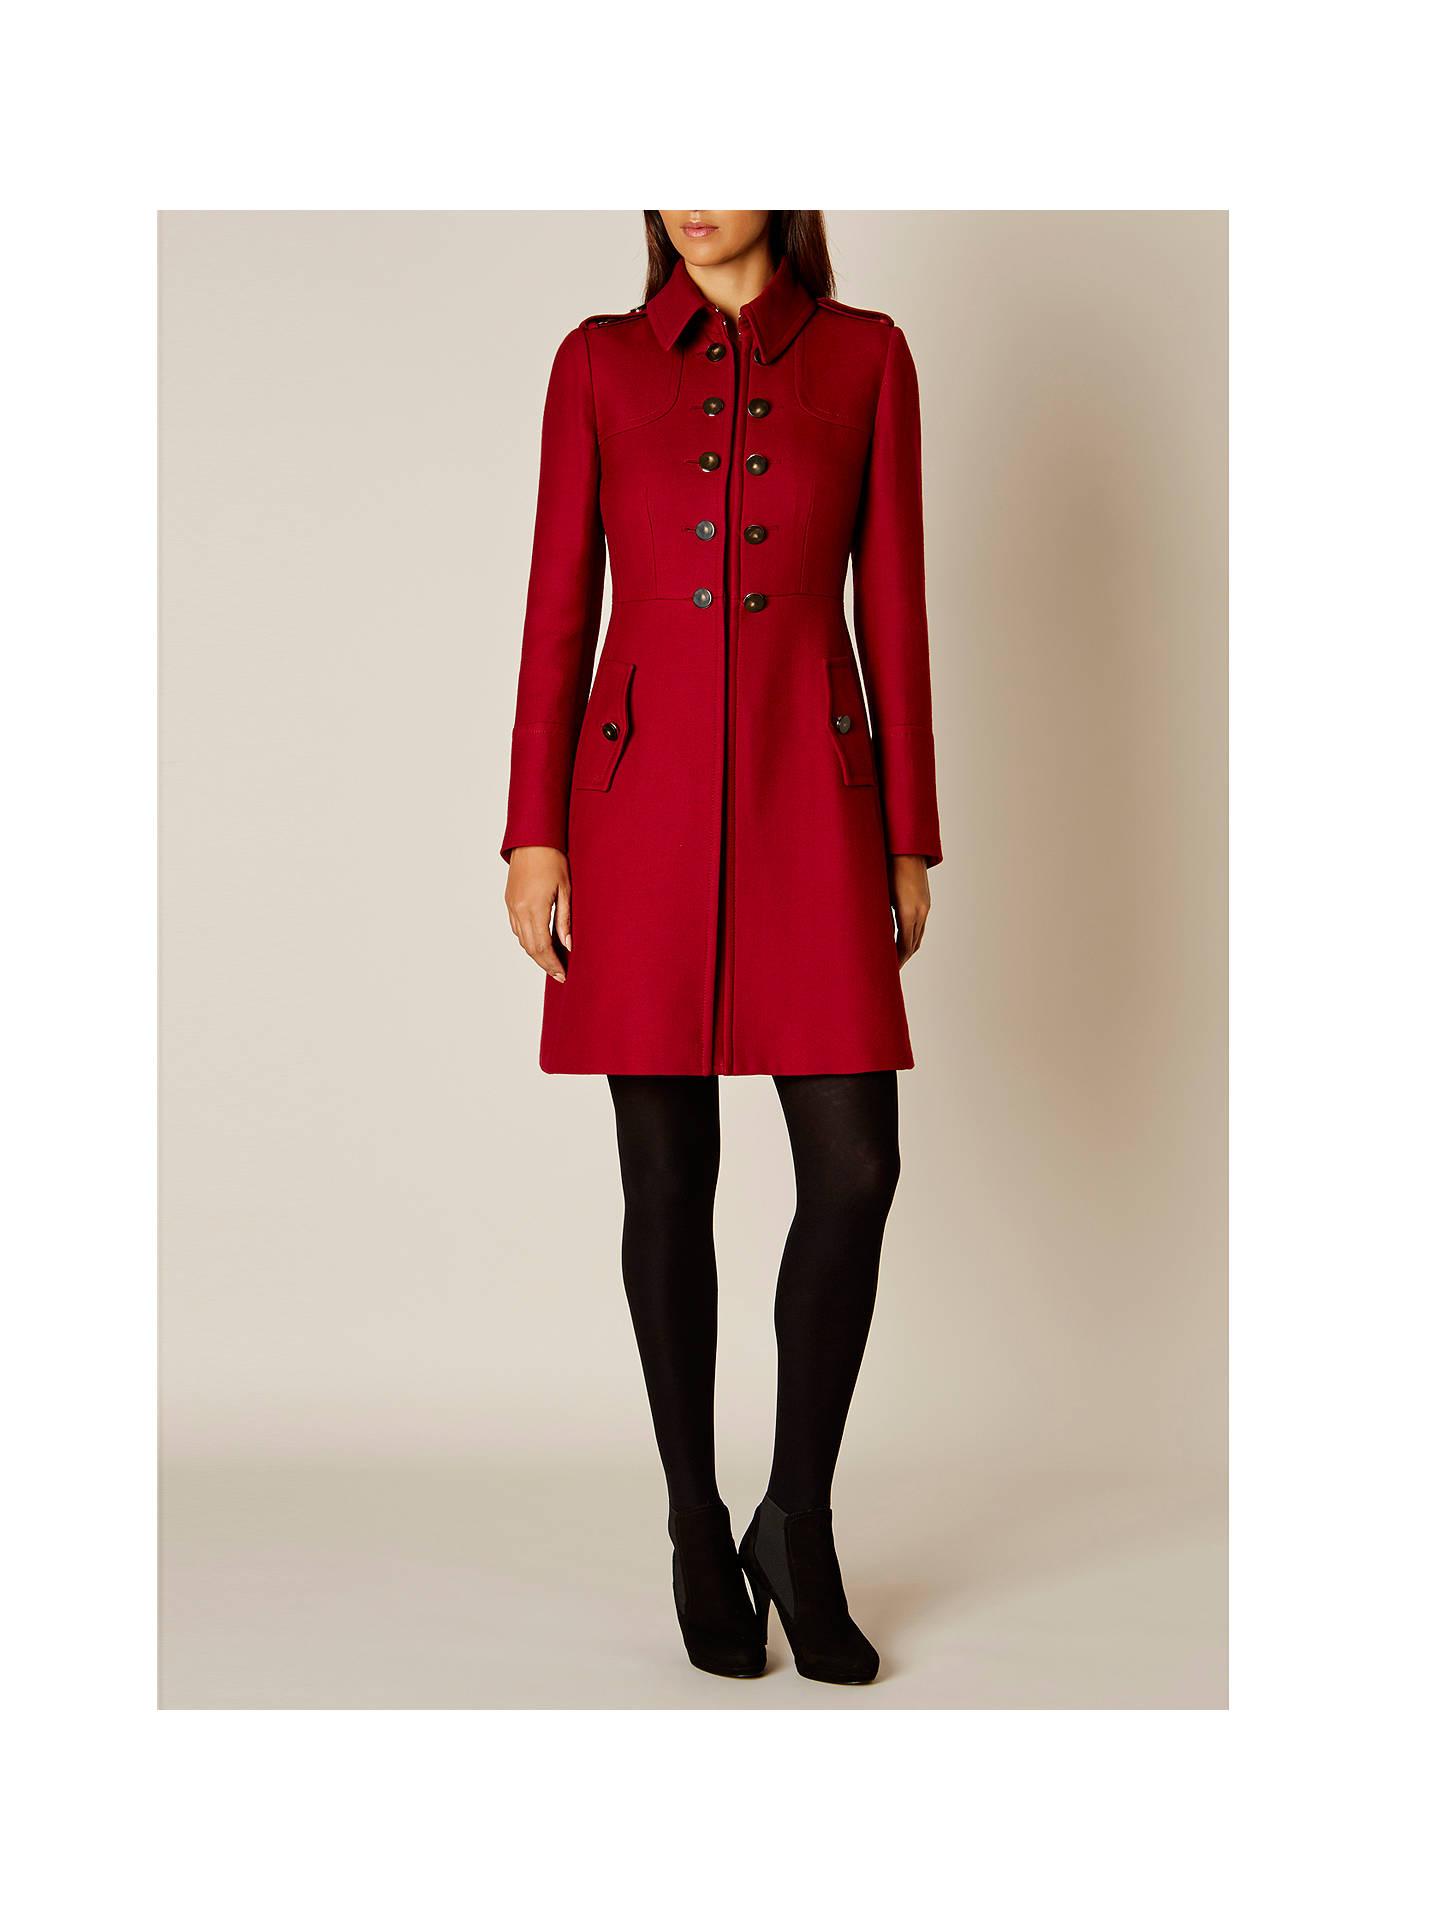 Image 2 of RED MILITARY COAT from Zara   Military coat, Coat